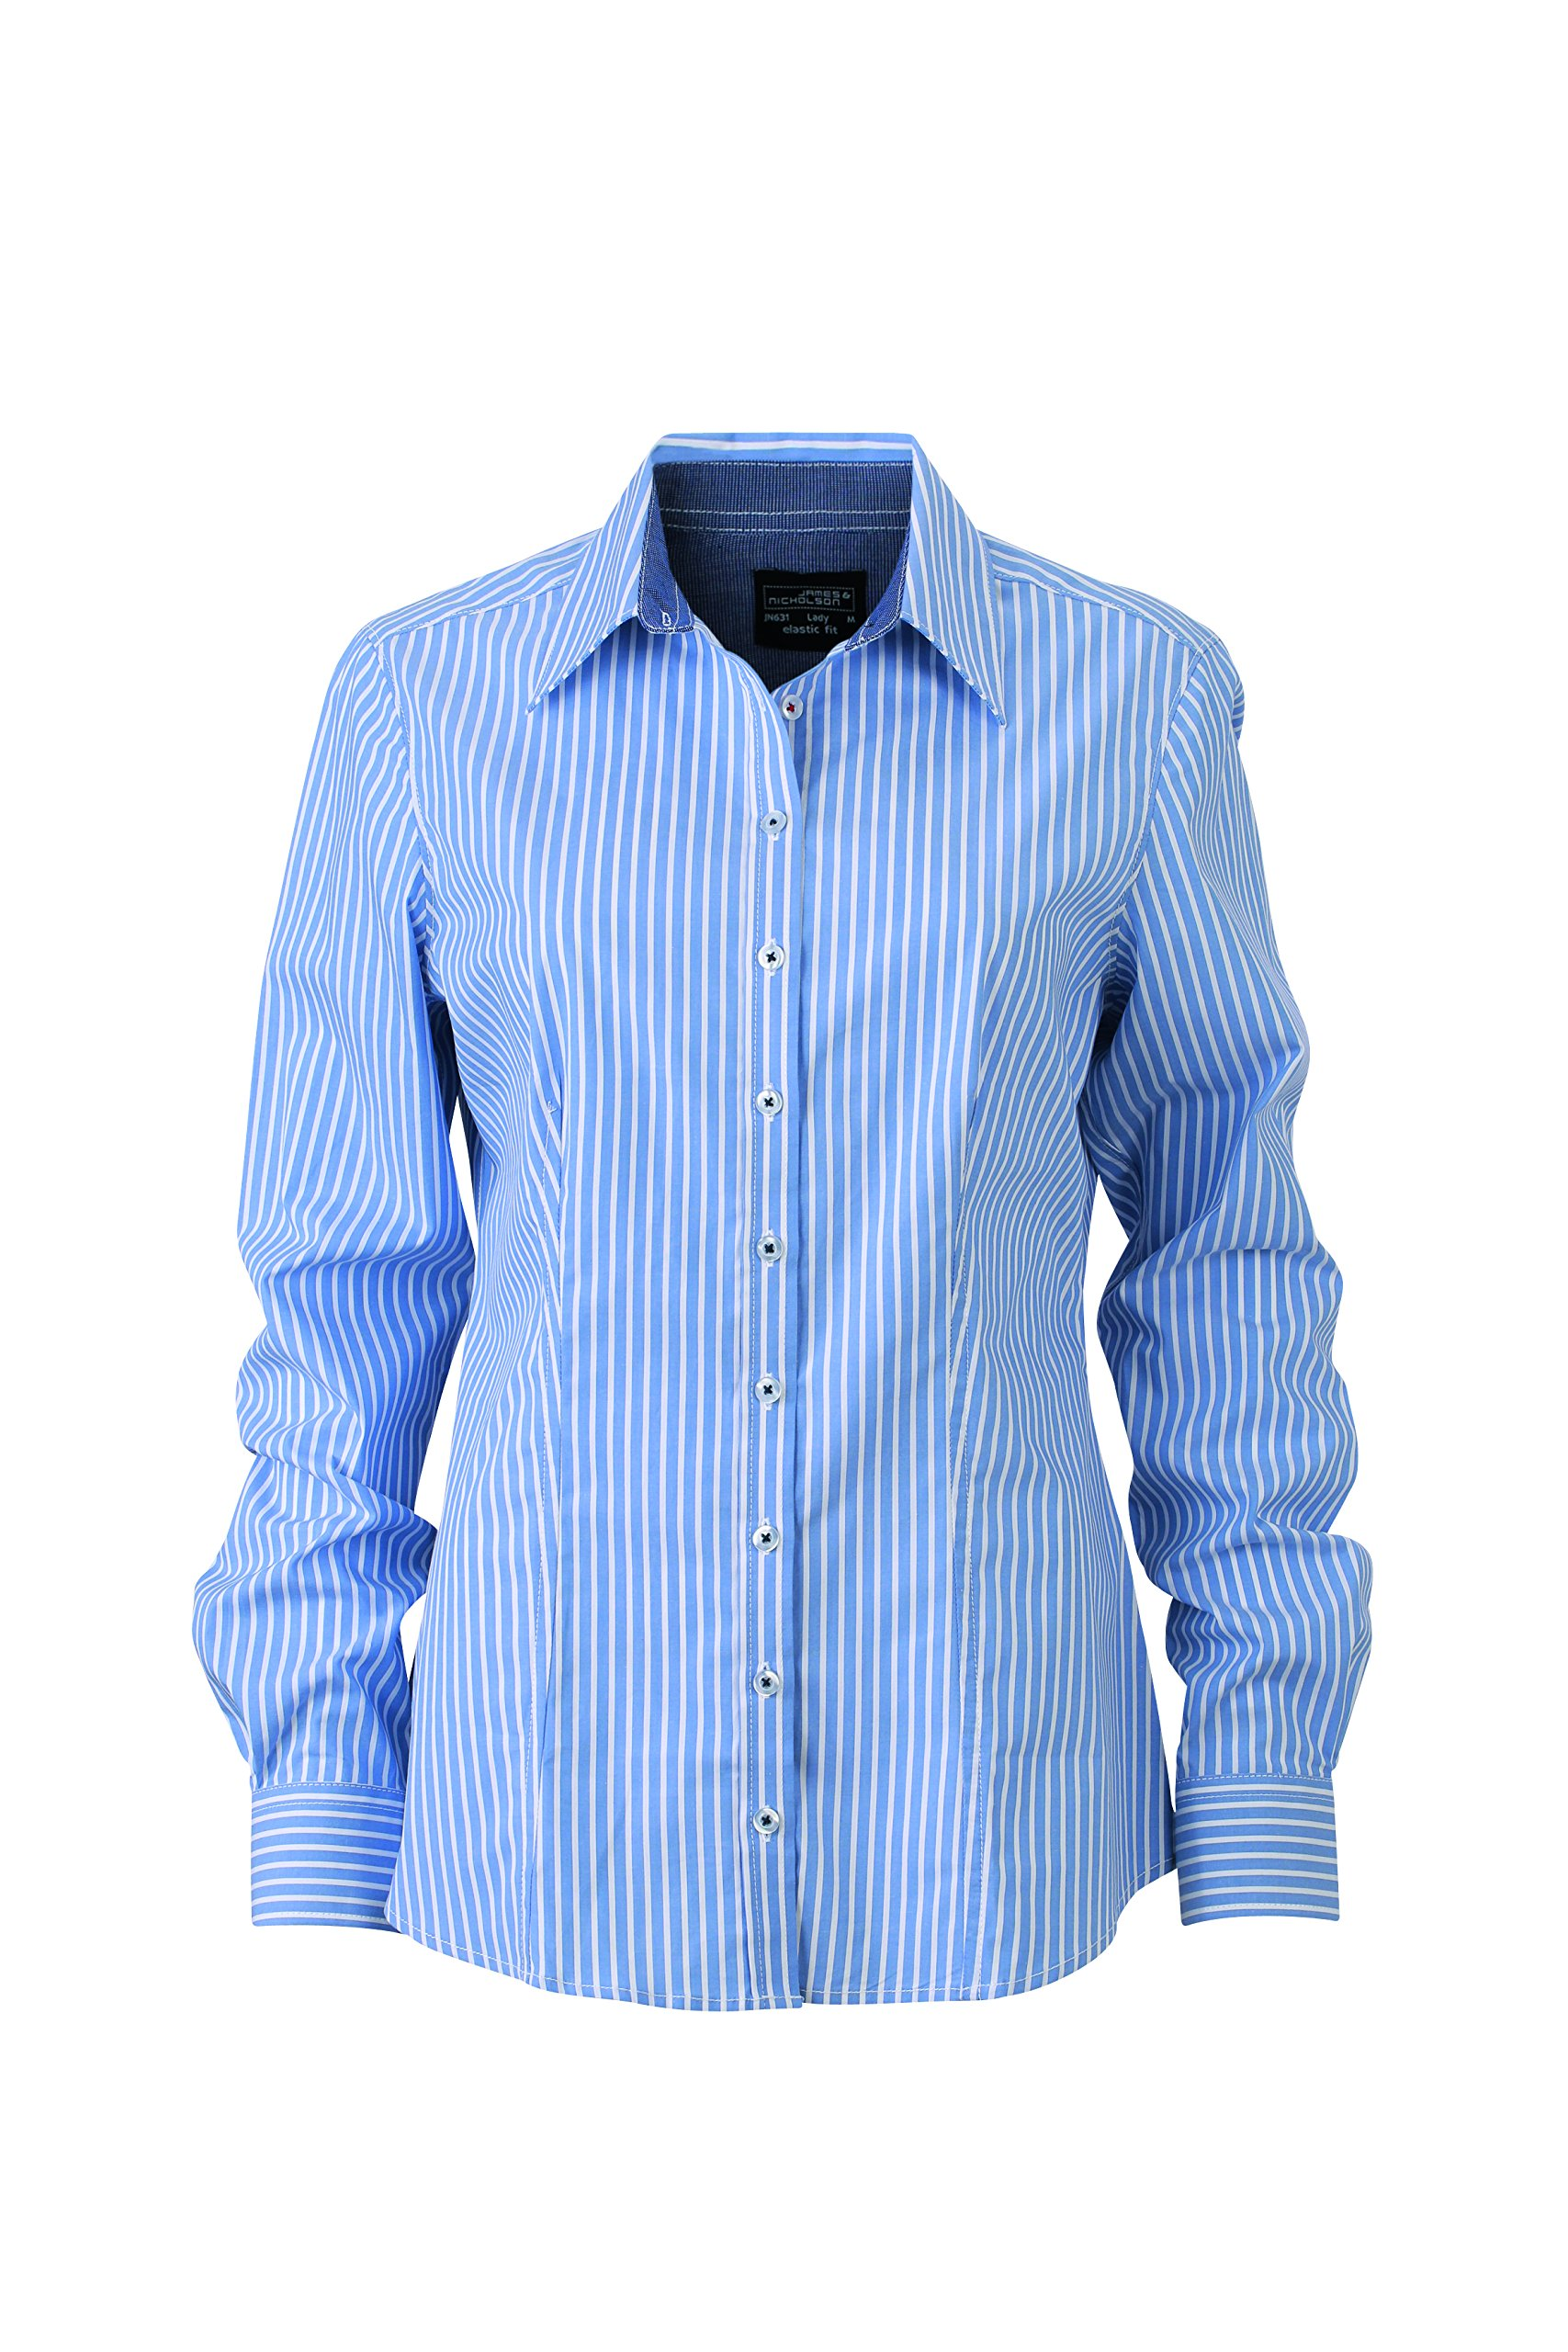 Jamesamp; Nicholson Femme navy38 white Shirt BlouseBlau Ladies' Light blue 4R35AjL